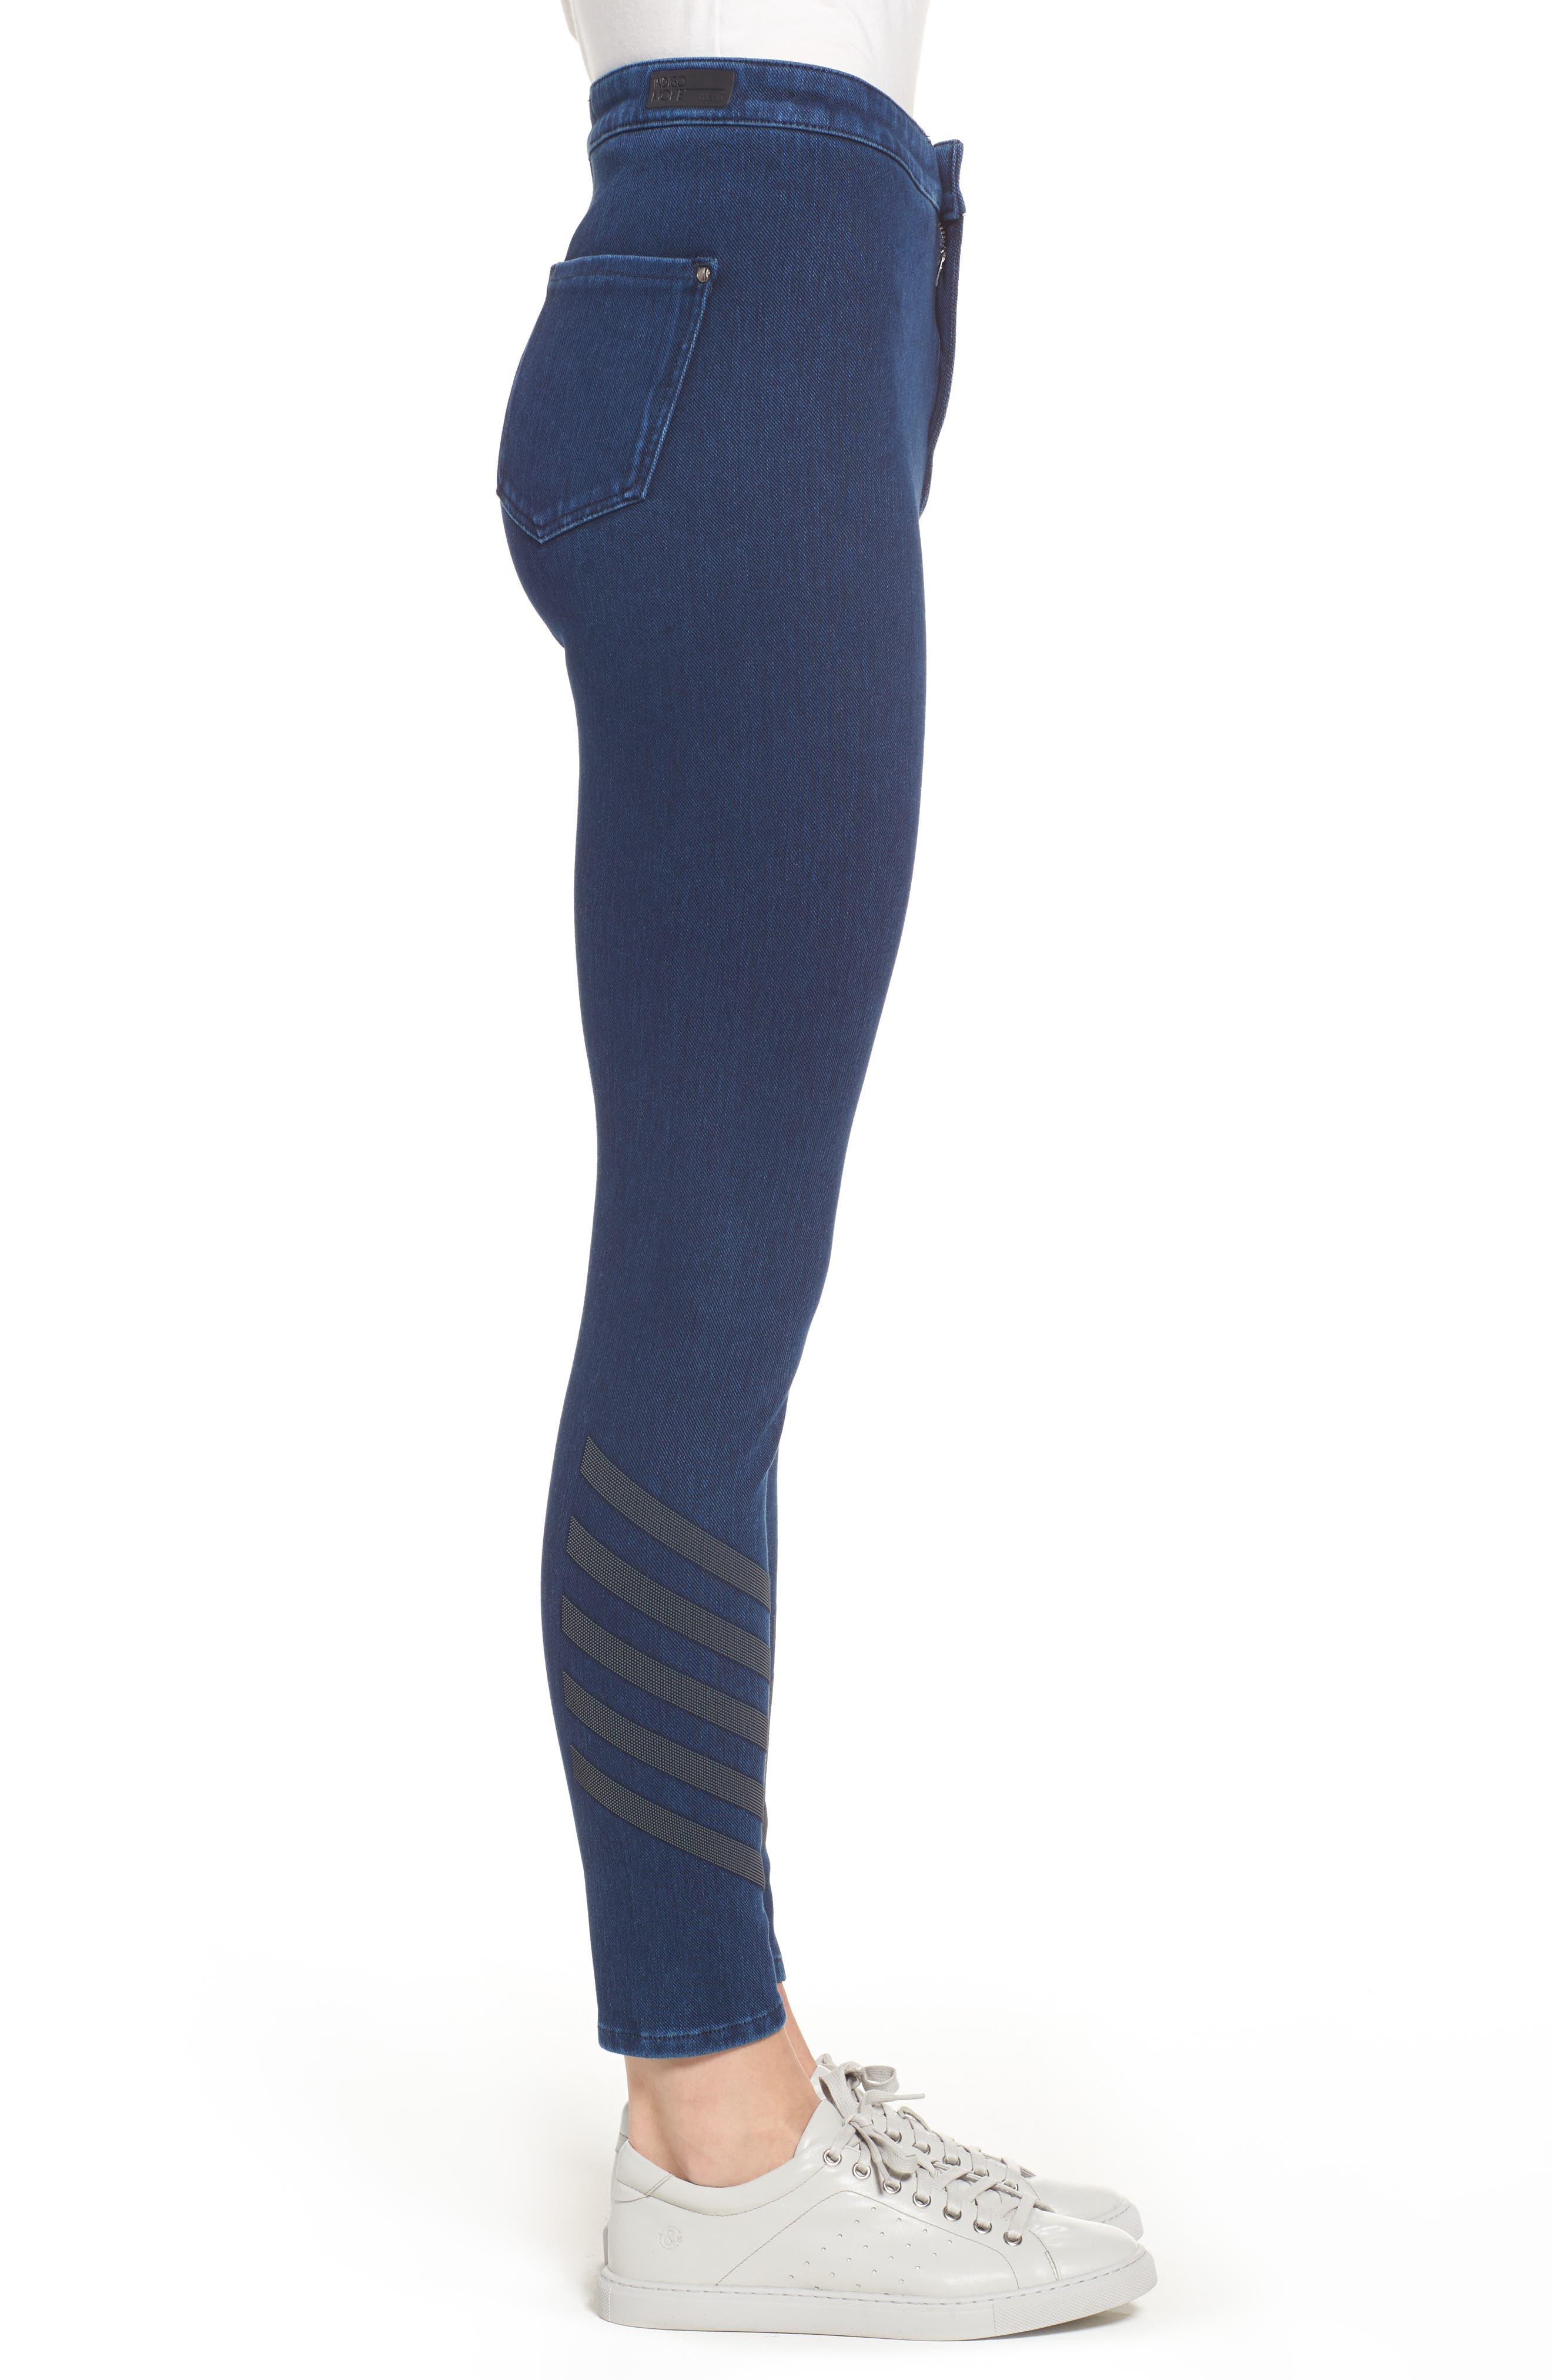 Joie Embellished High Waist Skinny Jeans,                             Alternate thumbnail 3, color,